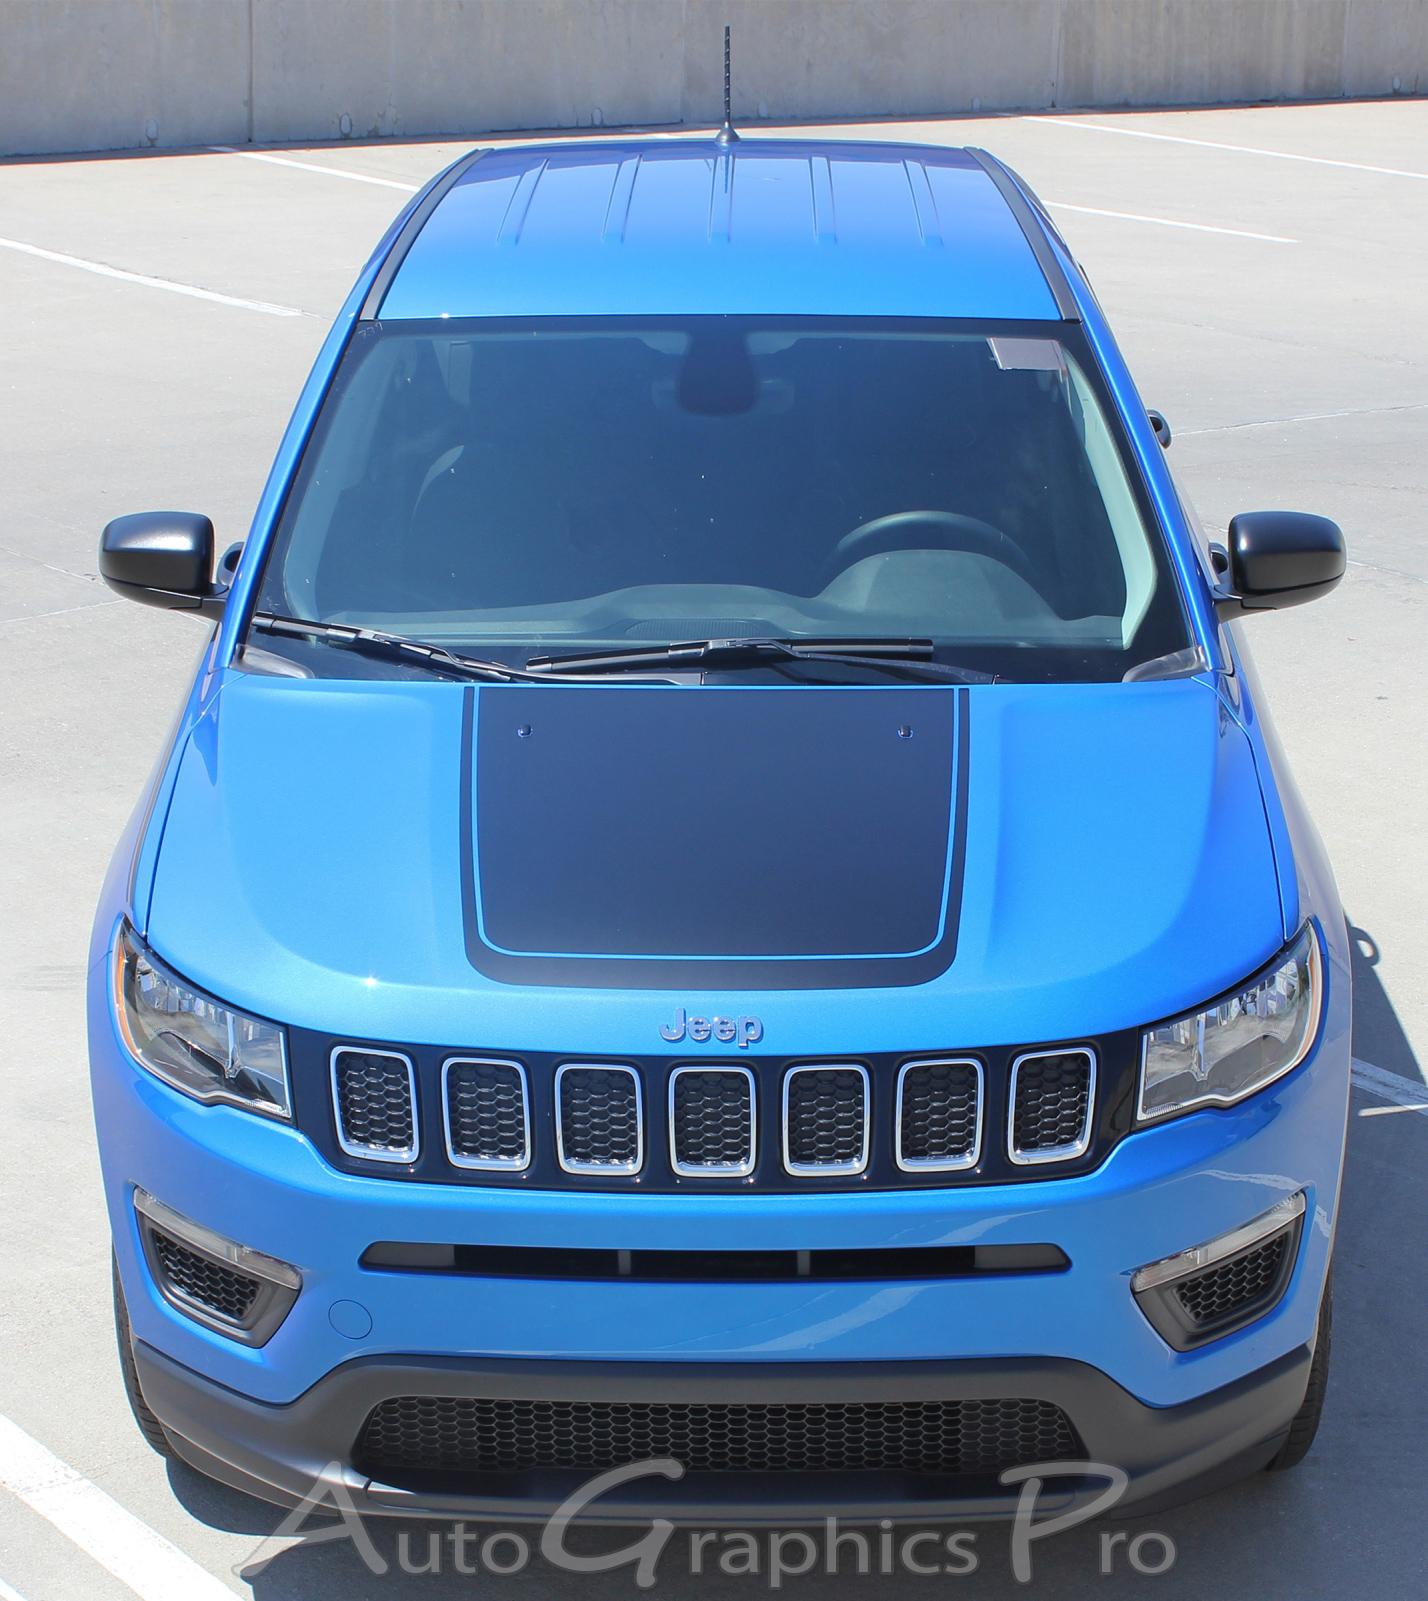 jeep compass hood vinyl graphics bearing decals stripes center blackout kit